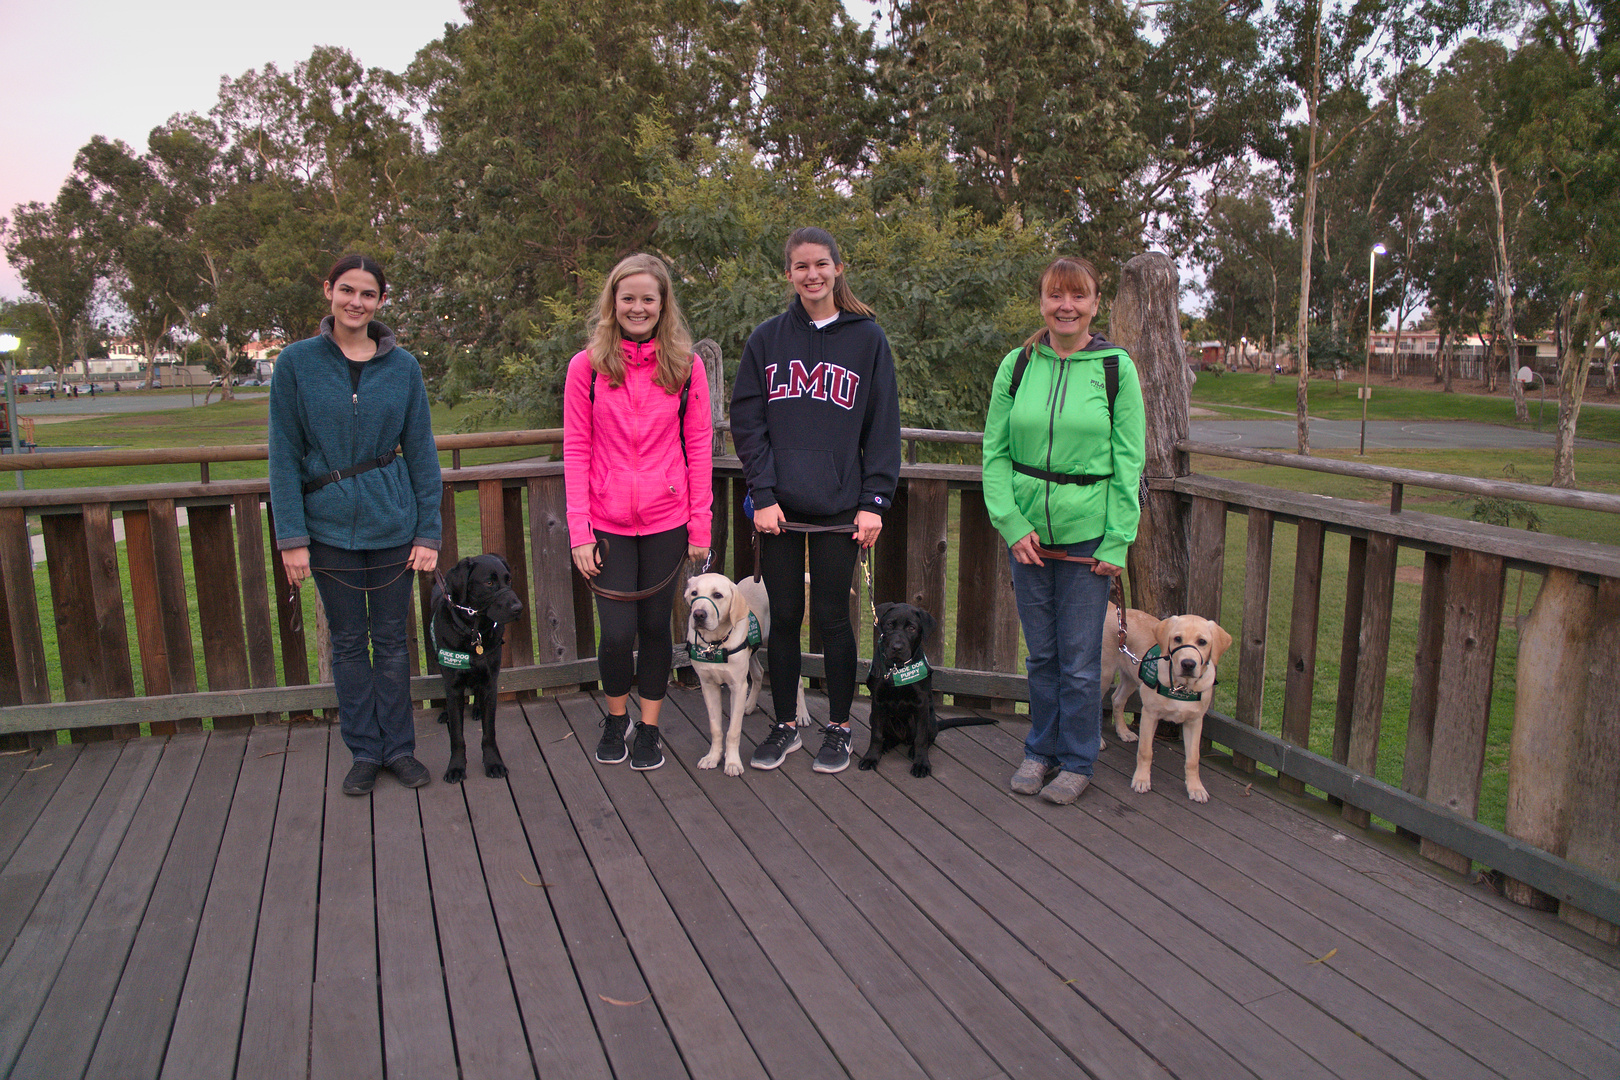 LASW Training in the park